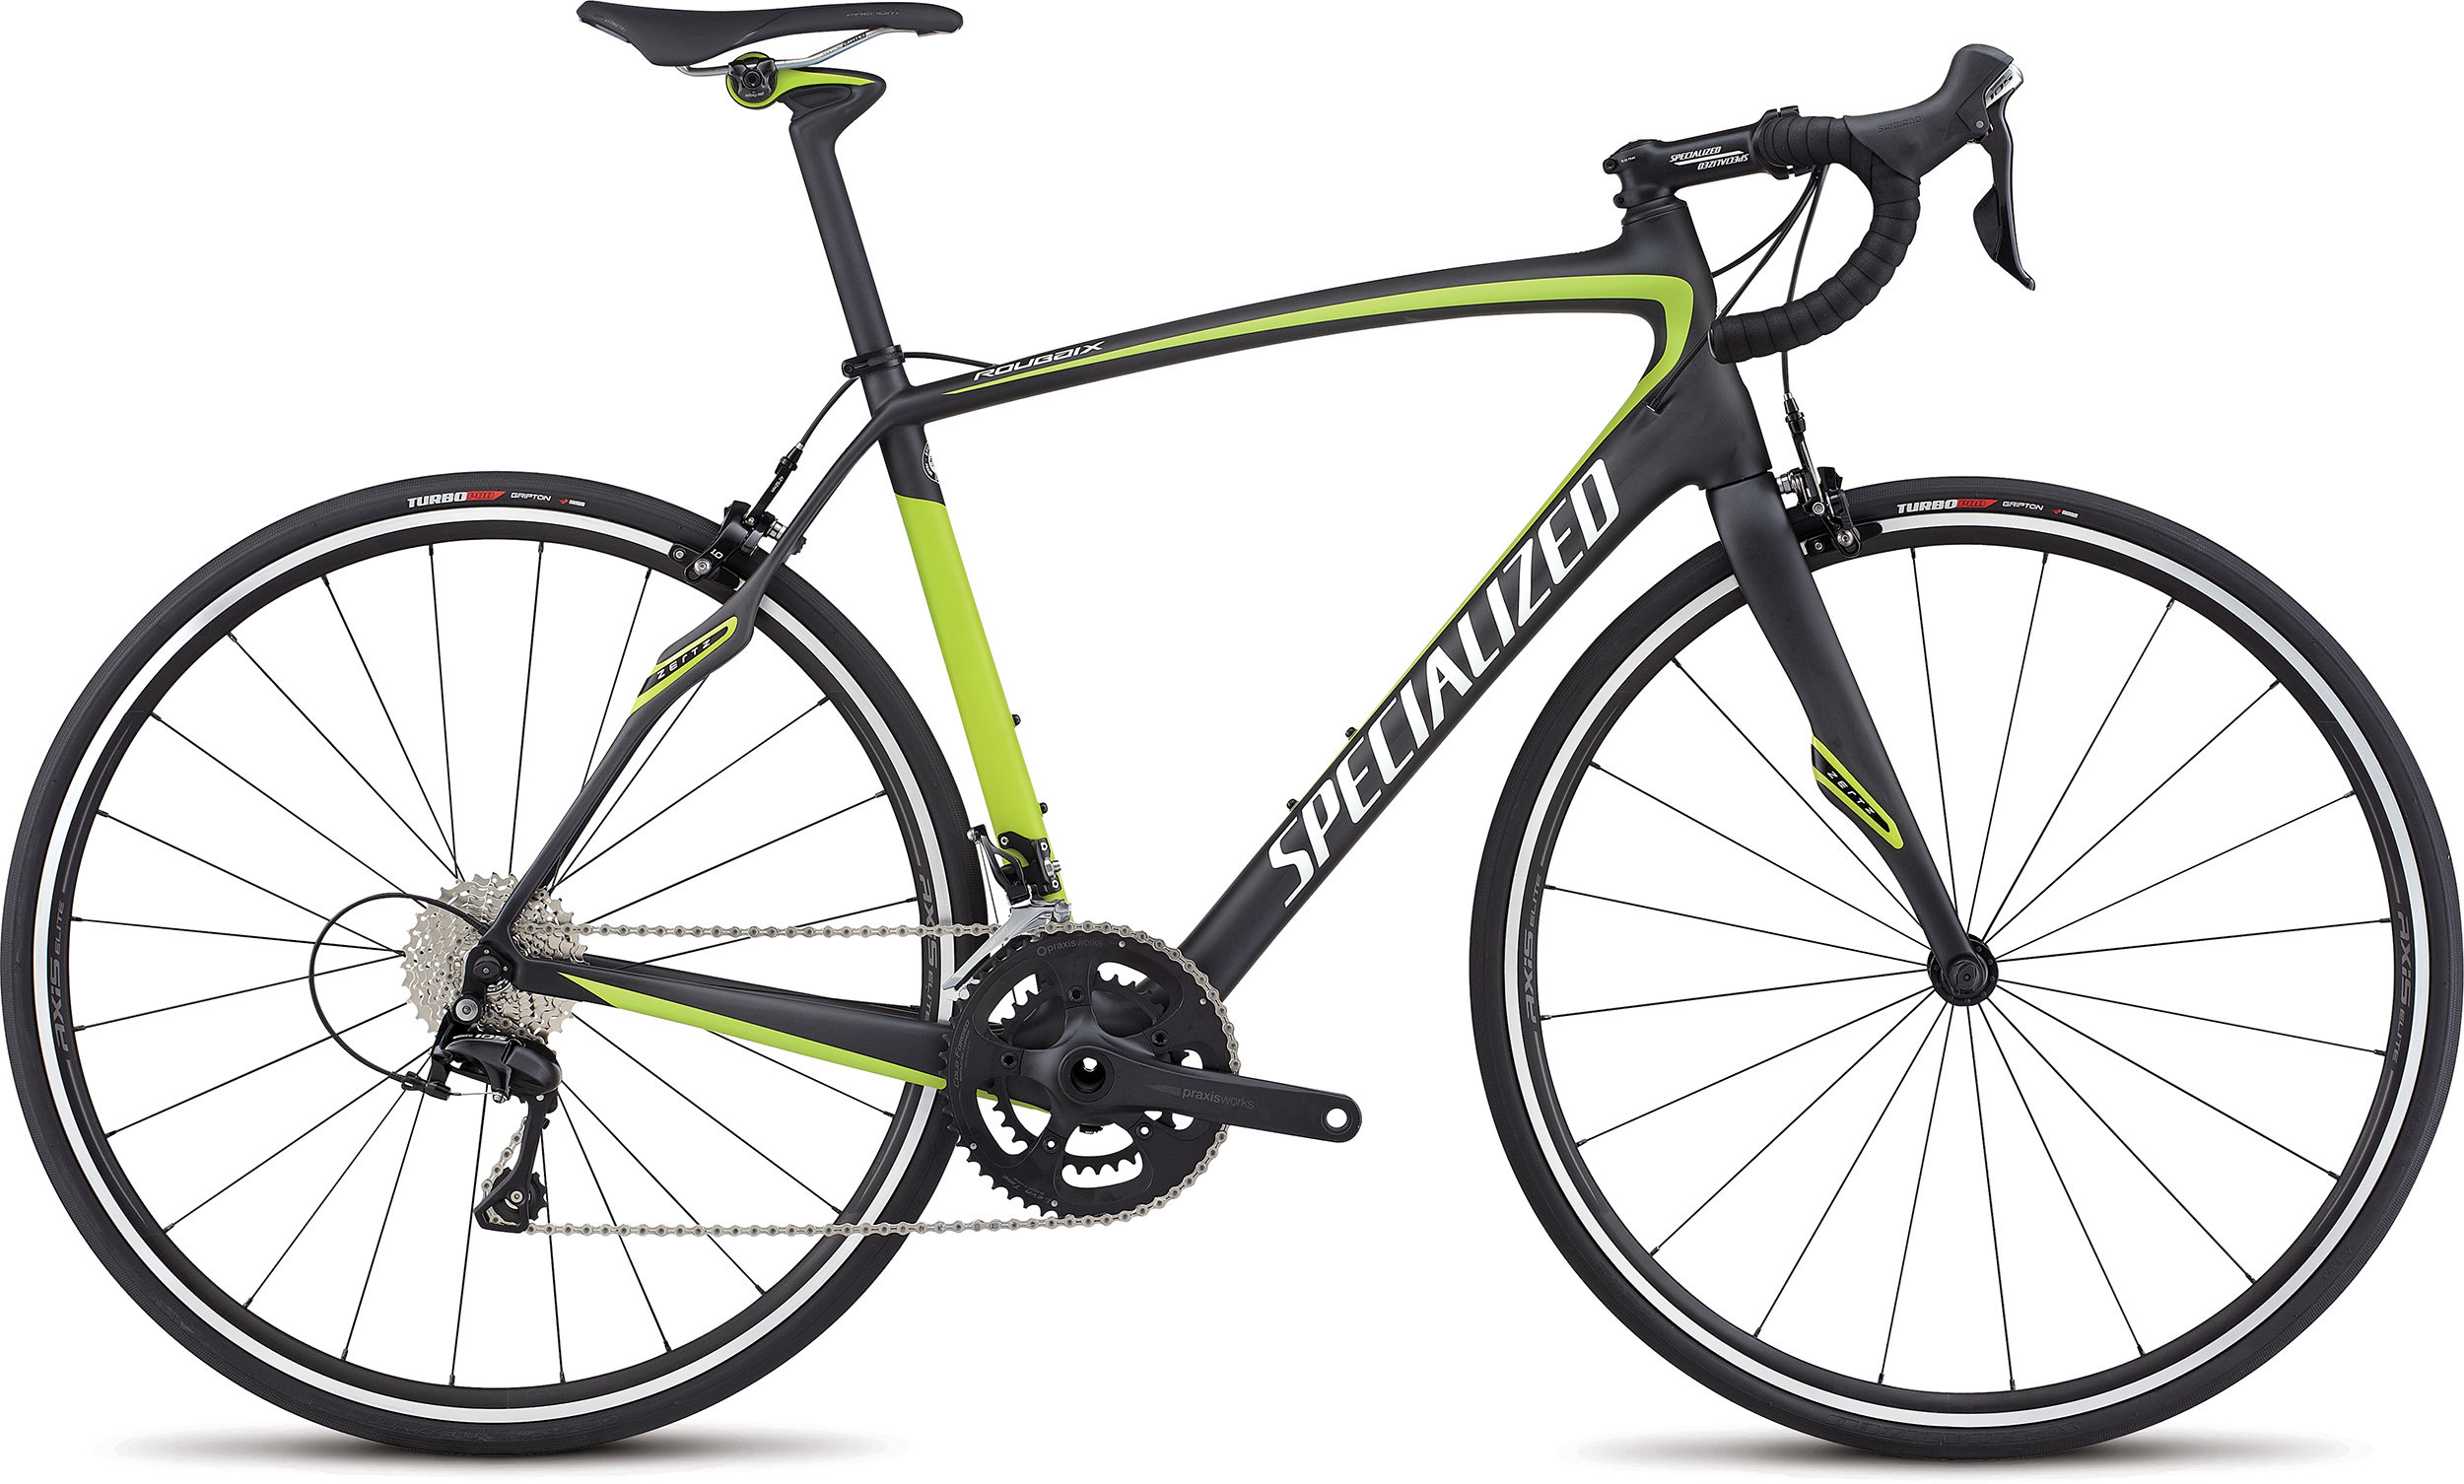 Specialized ROUBAIX SL4 Sport RIM RH 54 - Fahrrad online kaufen | Online Shop Bike Profis